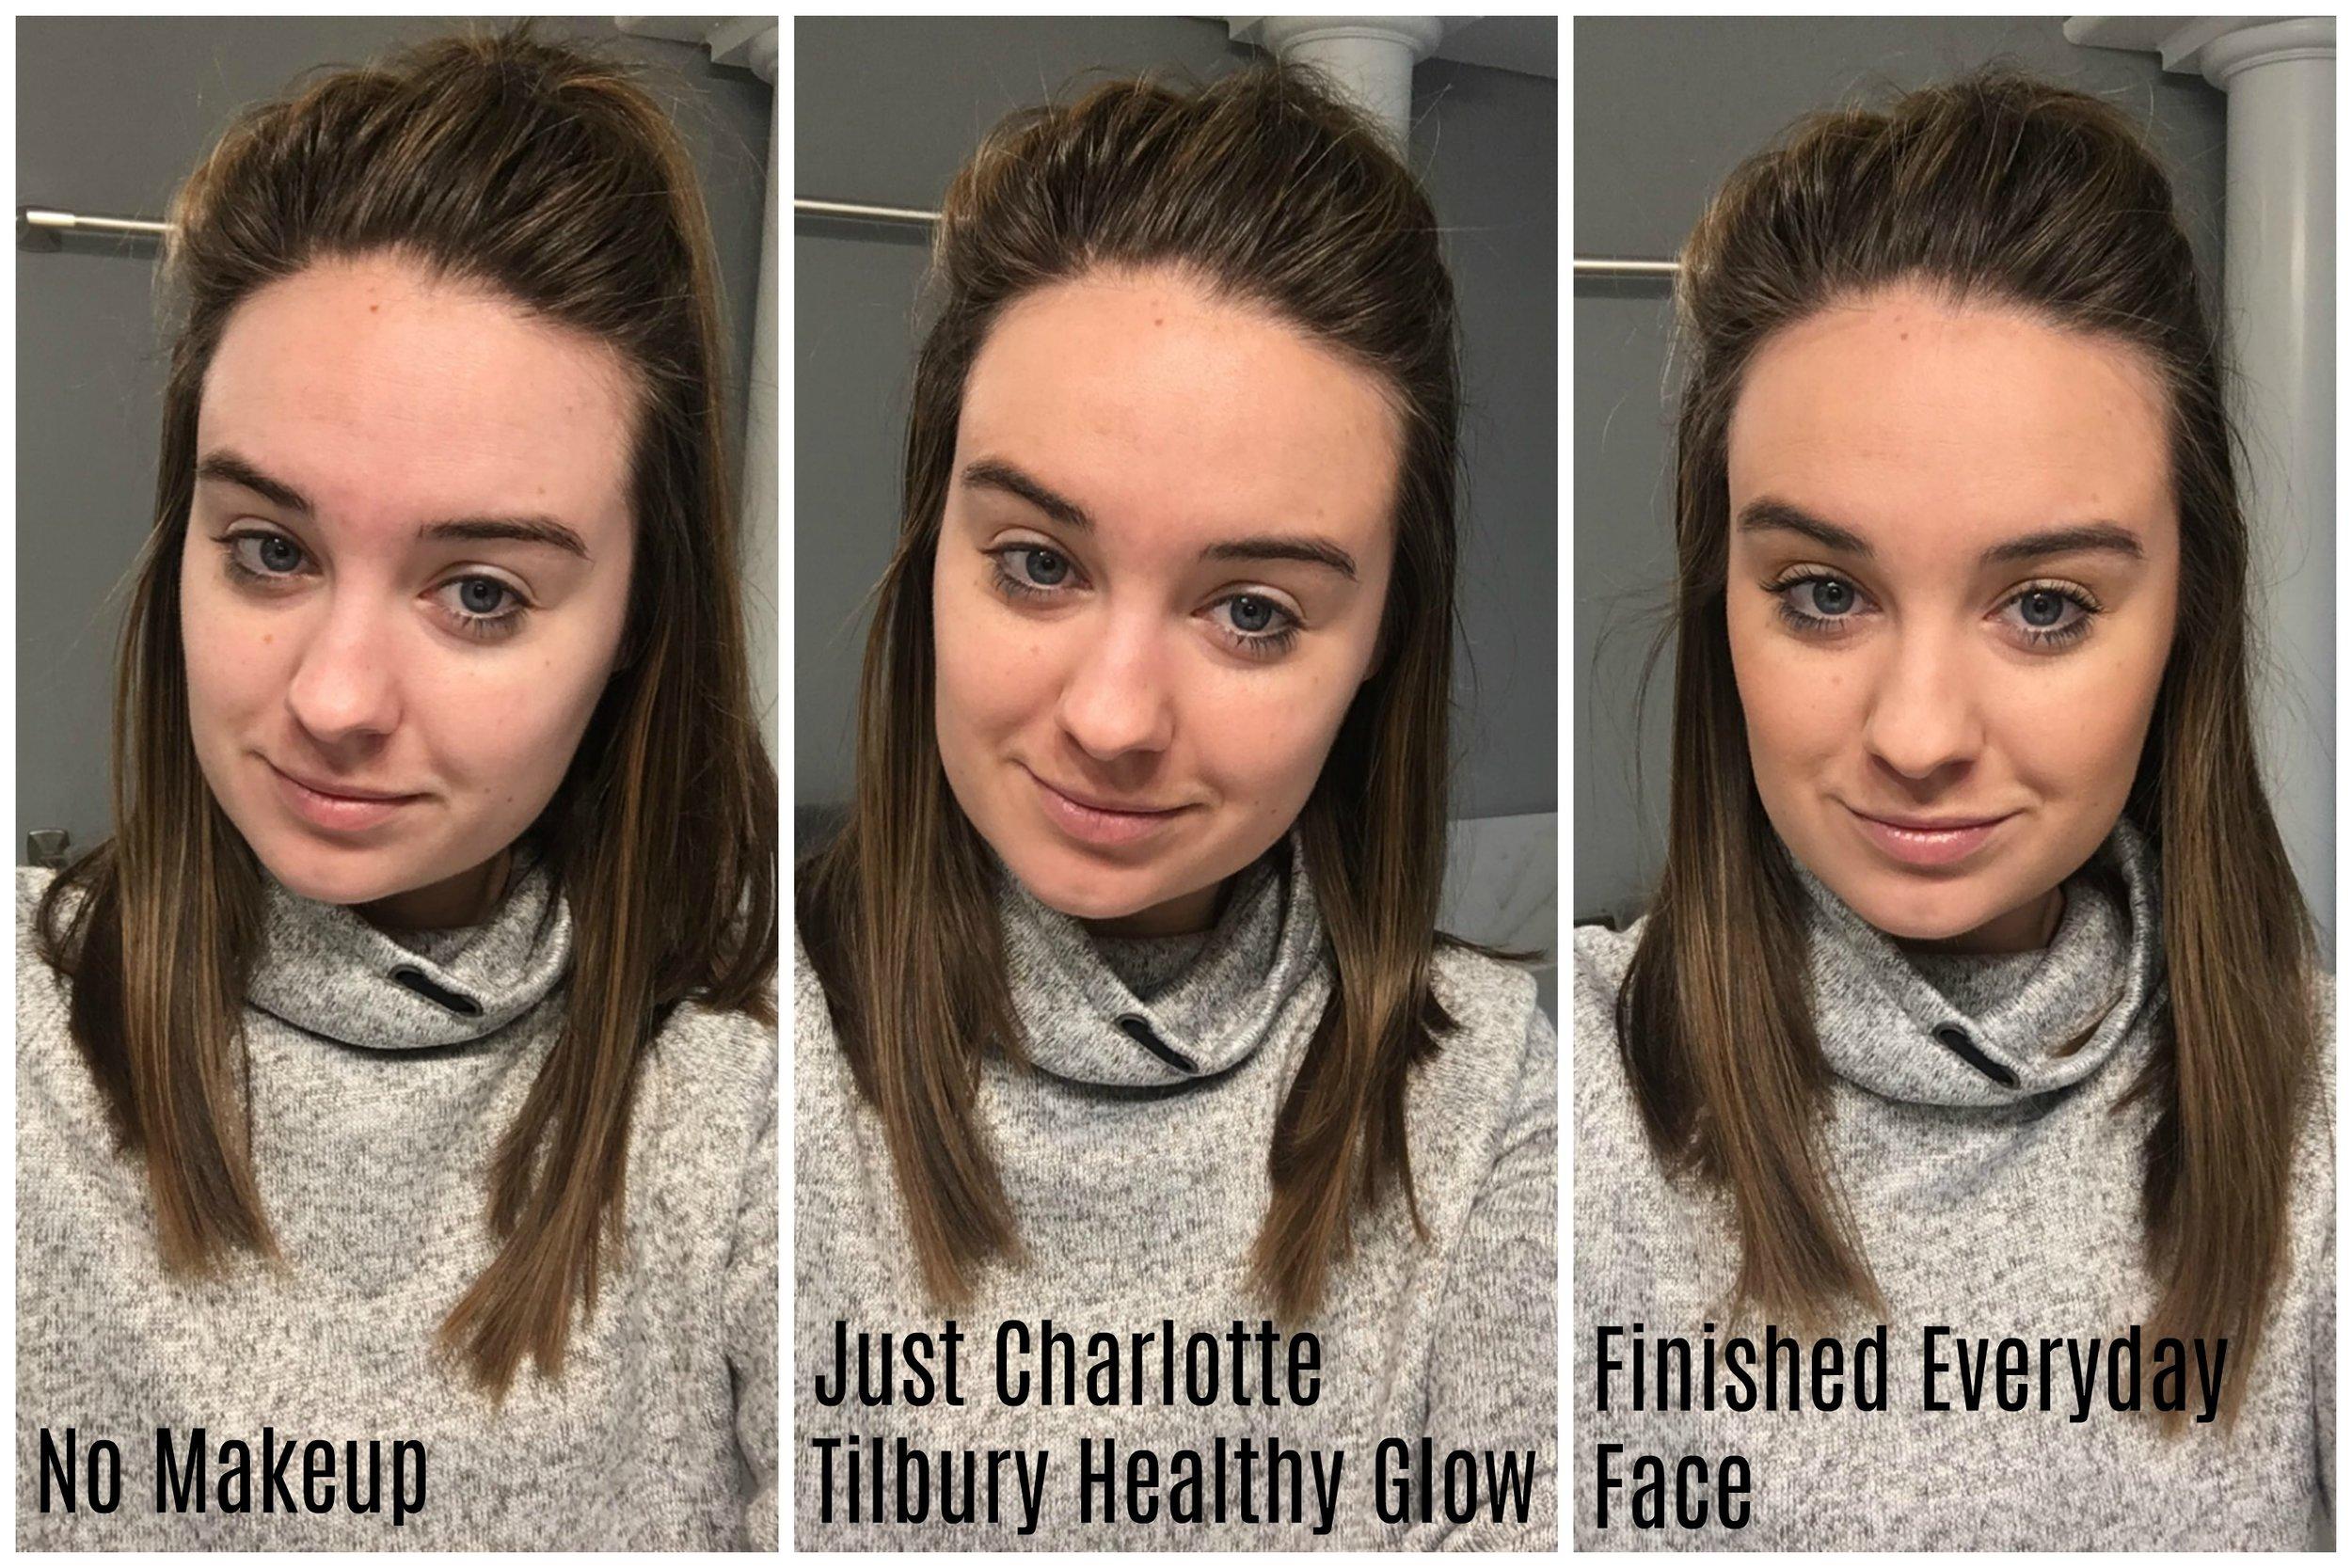 Charlotte Tilbury Healthy Glow